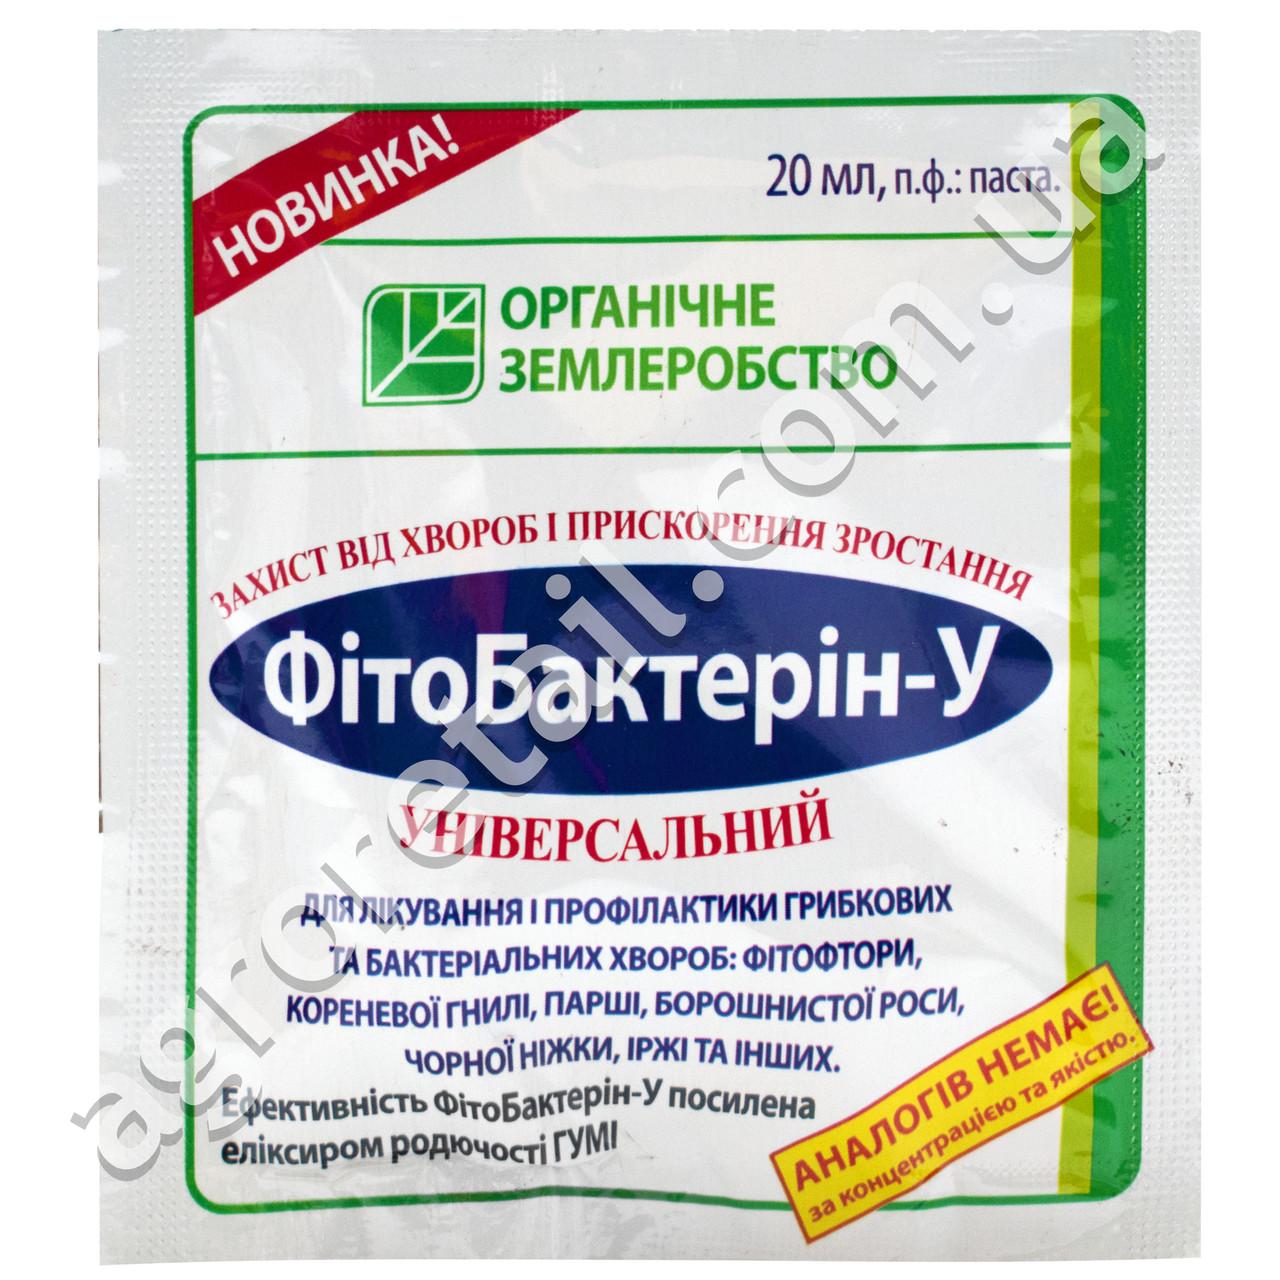 Фунгицид Фитобактерин-У паста 20 мл